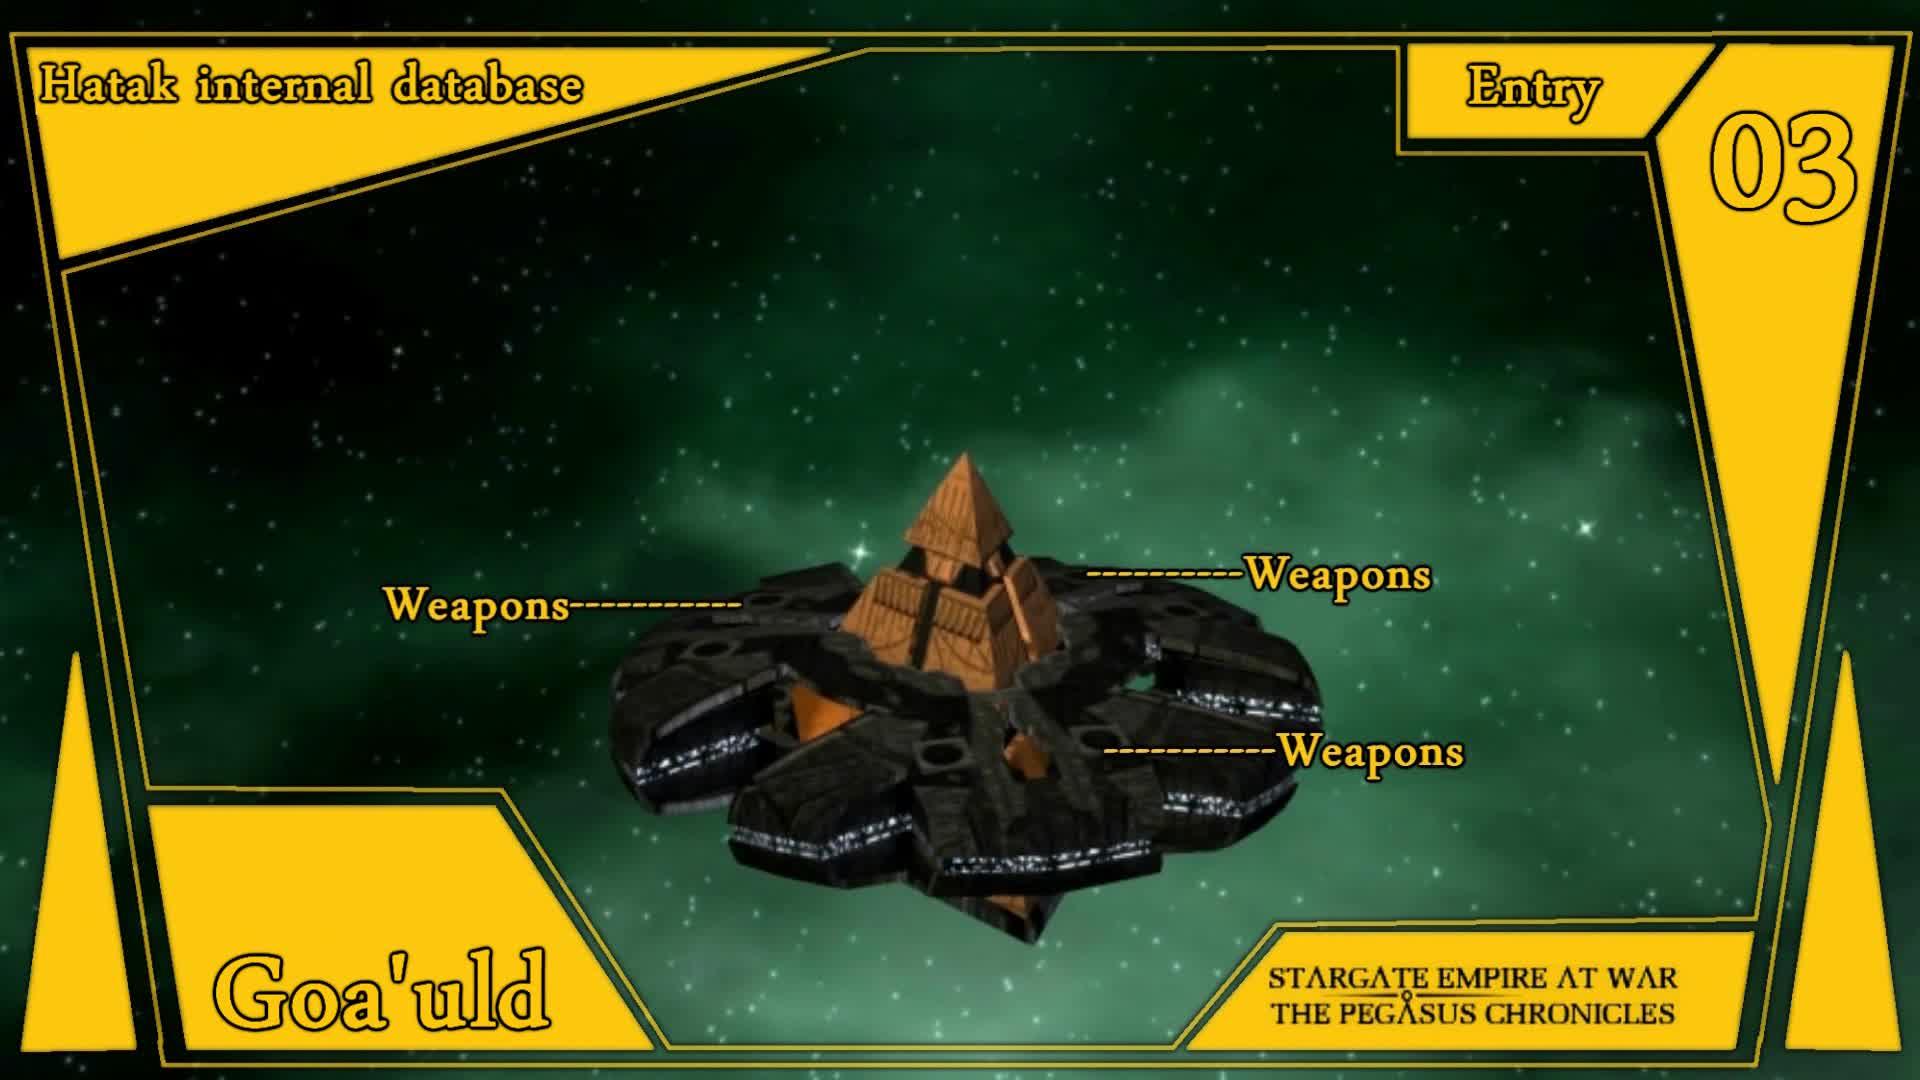 Unit Profile Old Hatak Video Stargate Empire At War